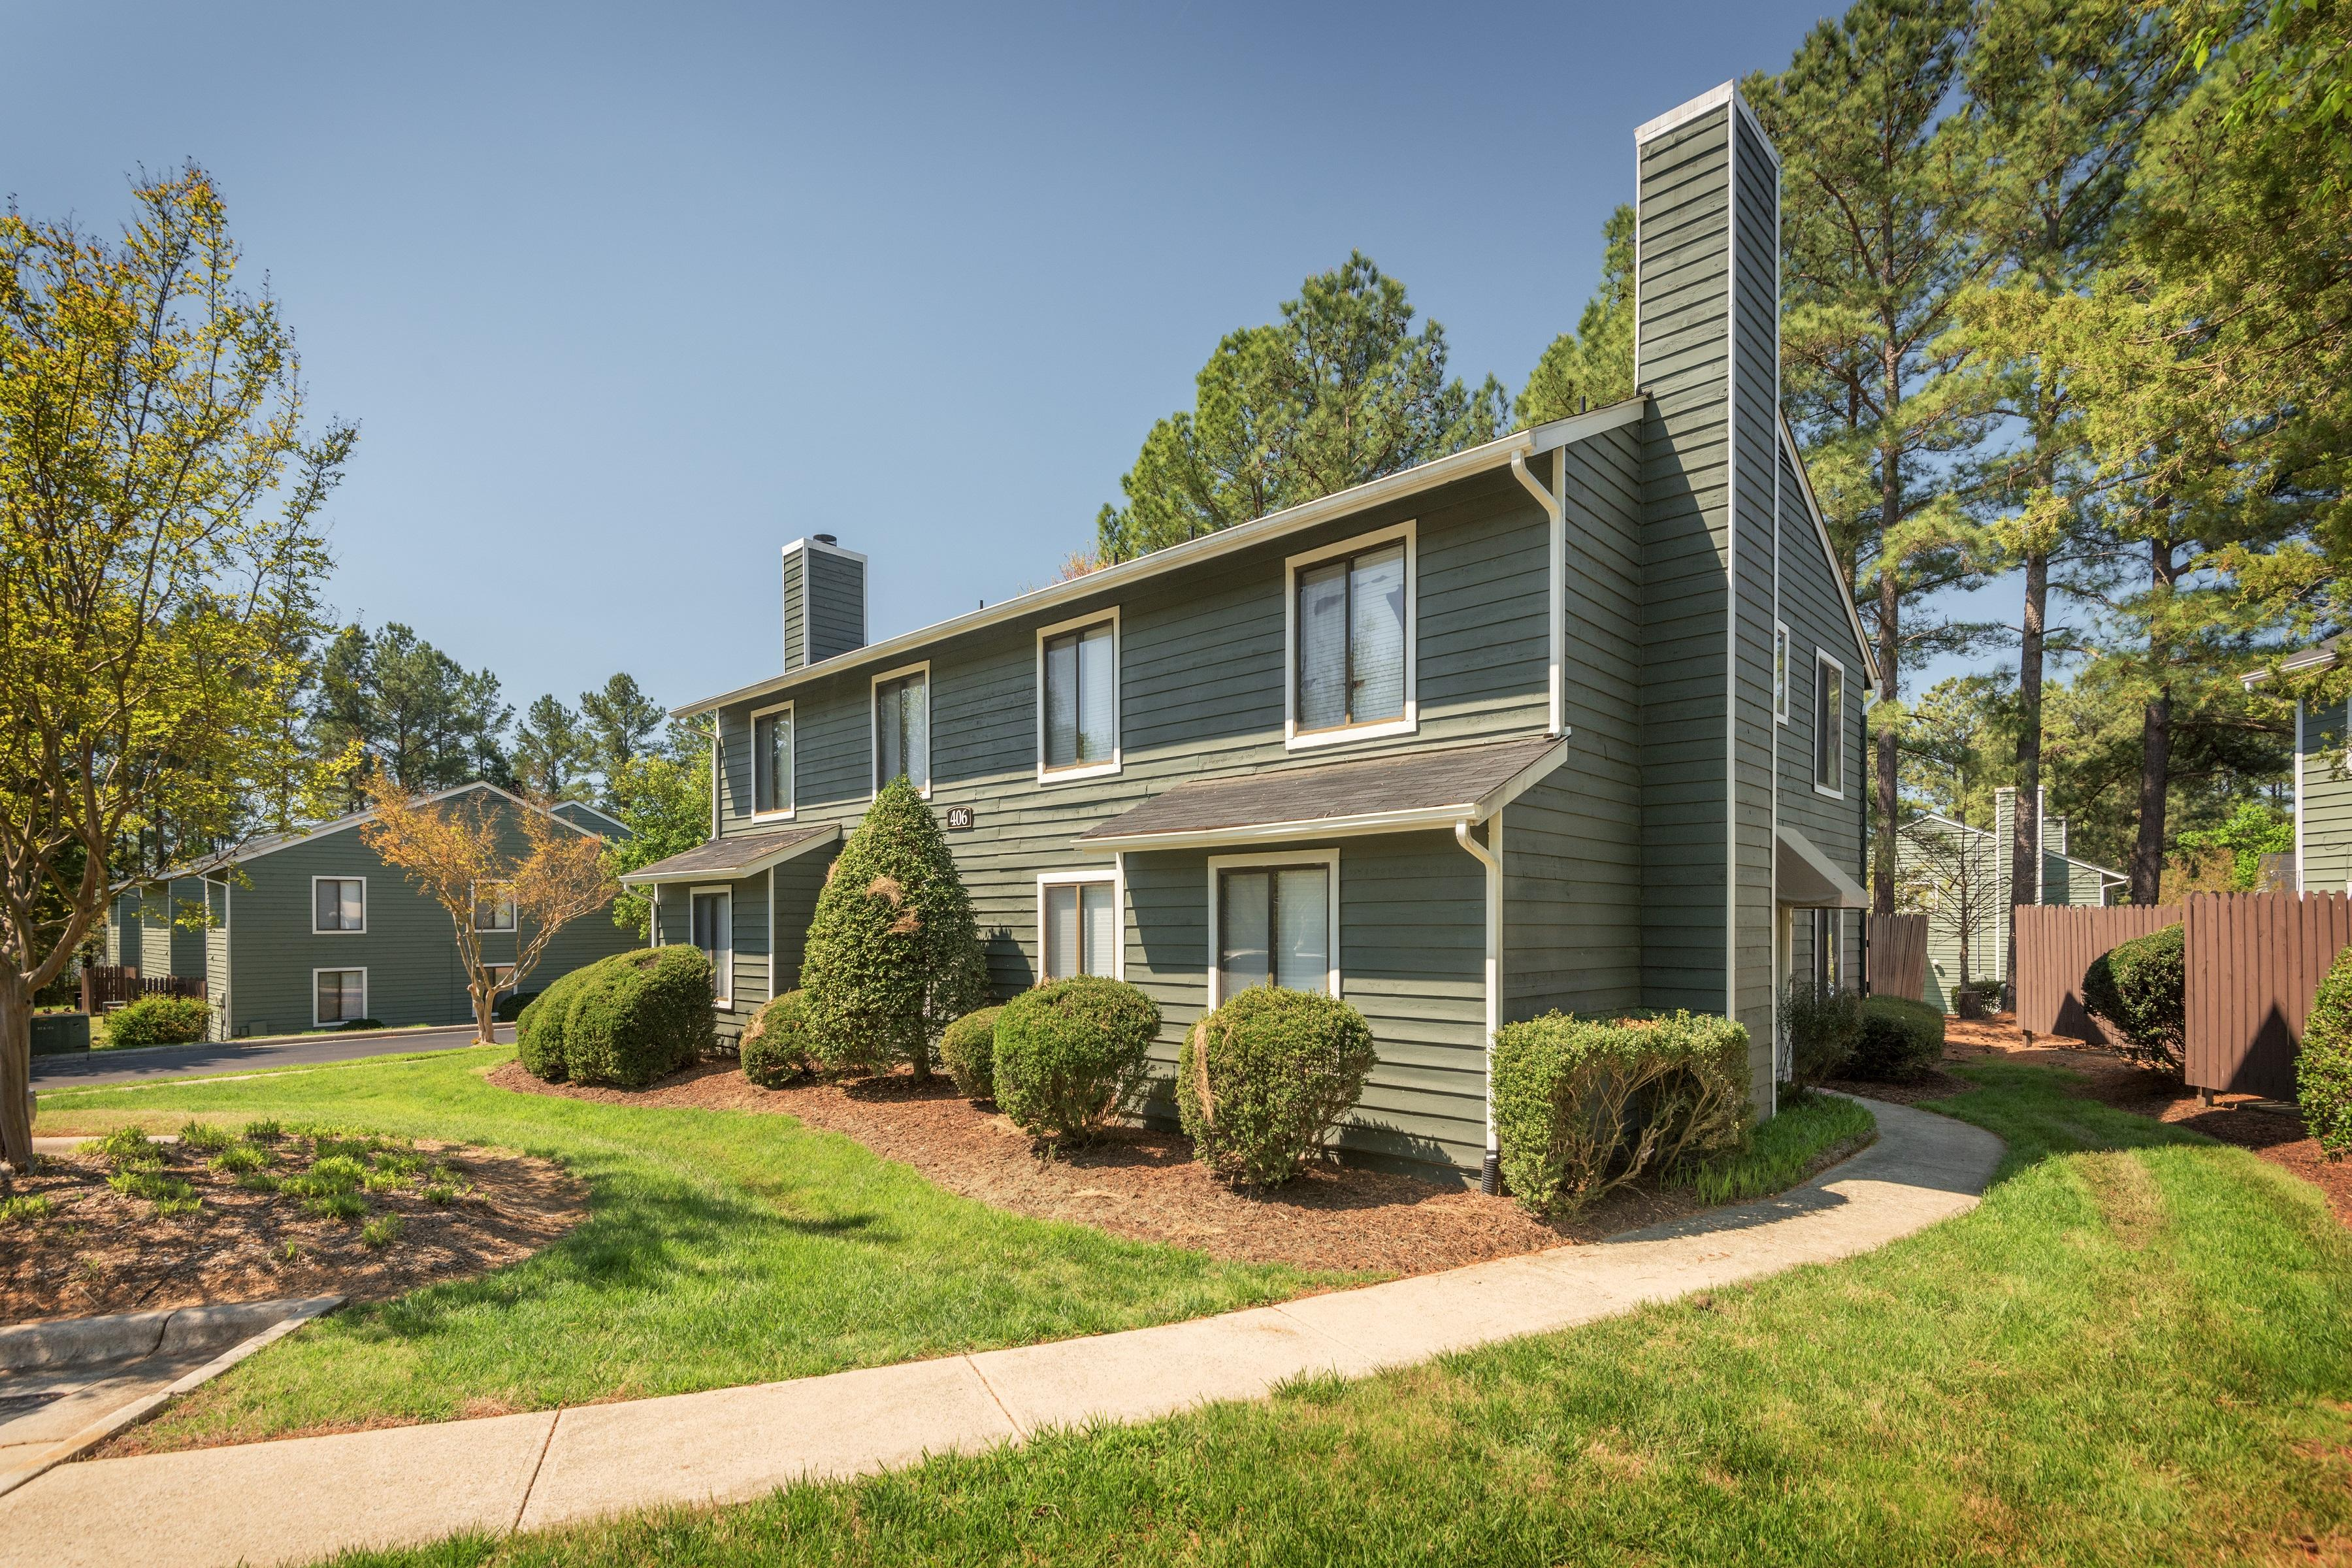 Morrisville Nc Apartments Reviews